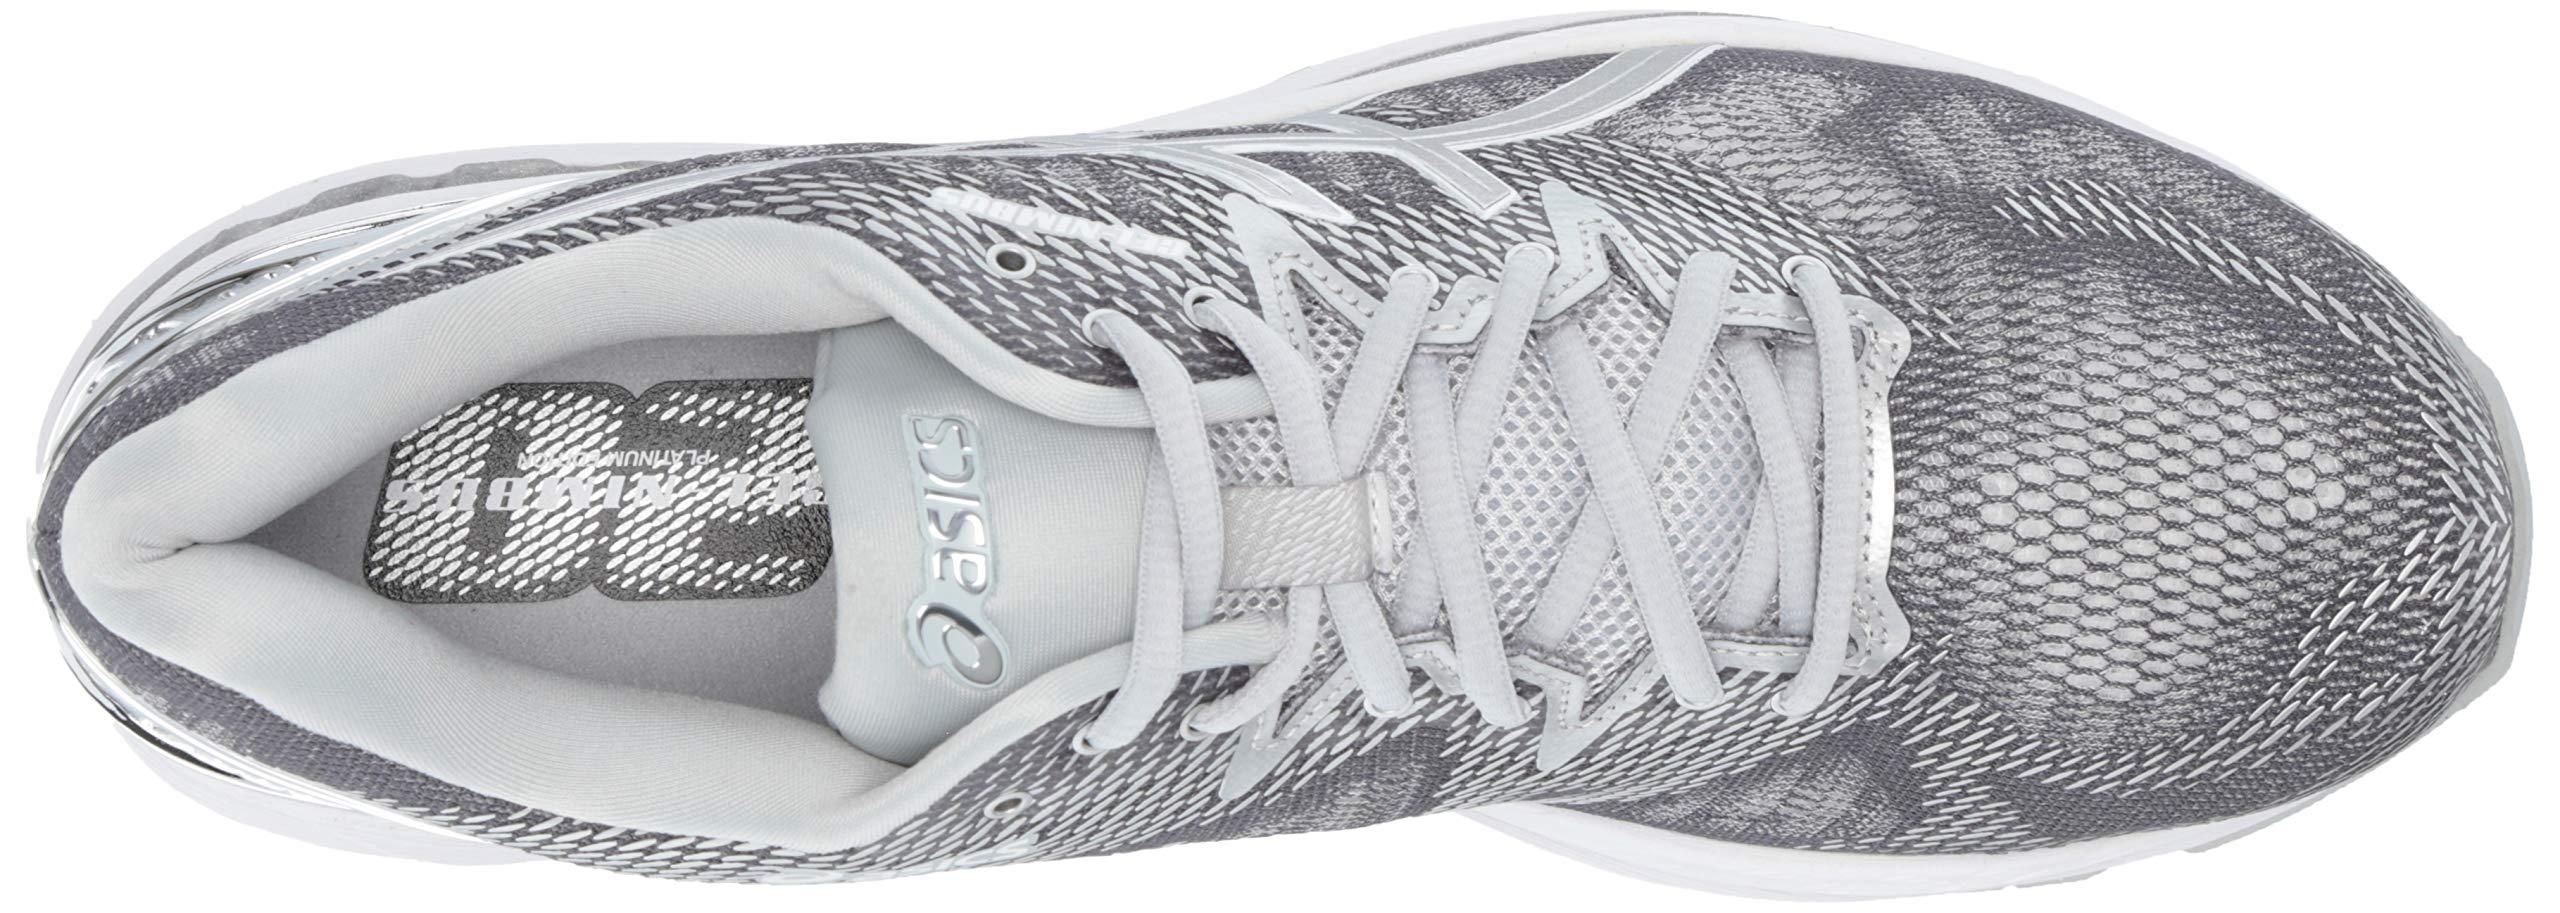 ASICS Mens Fitness/Cross-Training Trail Running Shoe, Carbon/Silver/White, 7 Medium US by ASICS (Image #7)